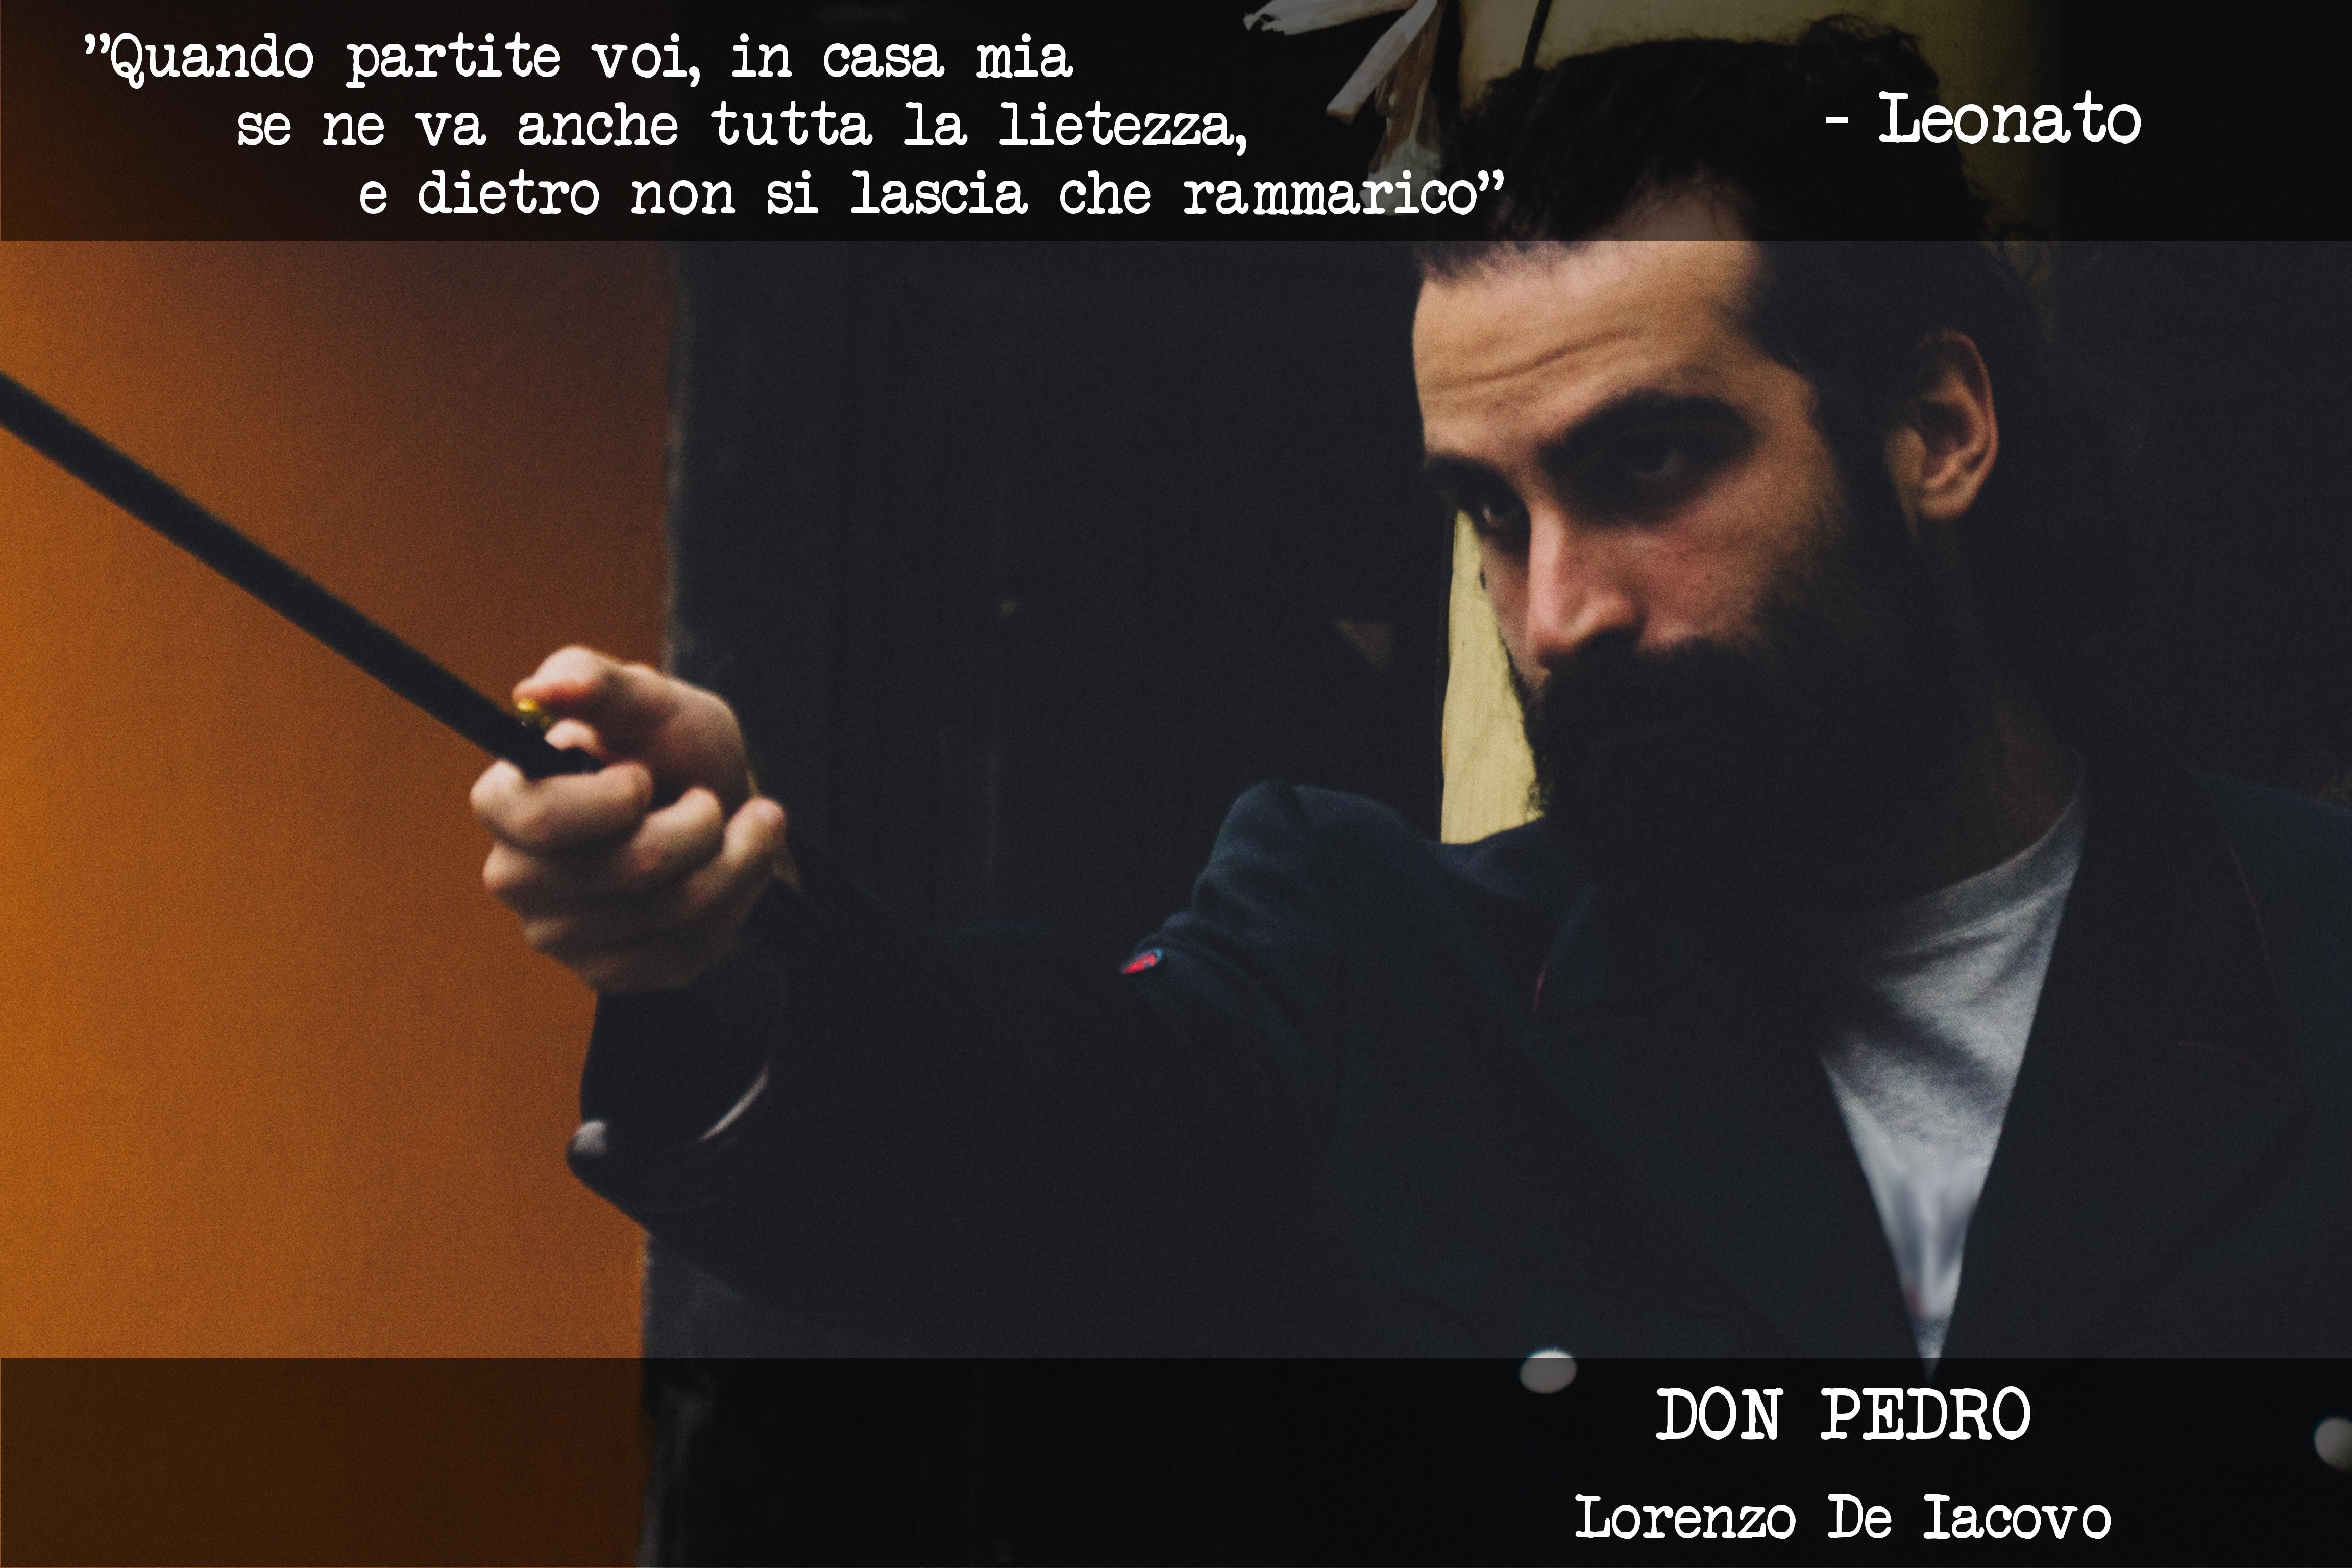 DONPEDRO - Lorenzo De Iacovo